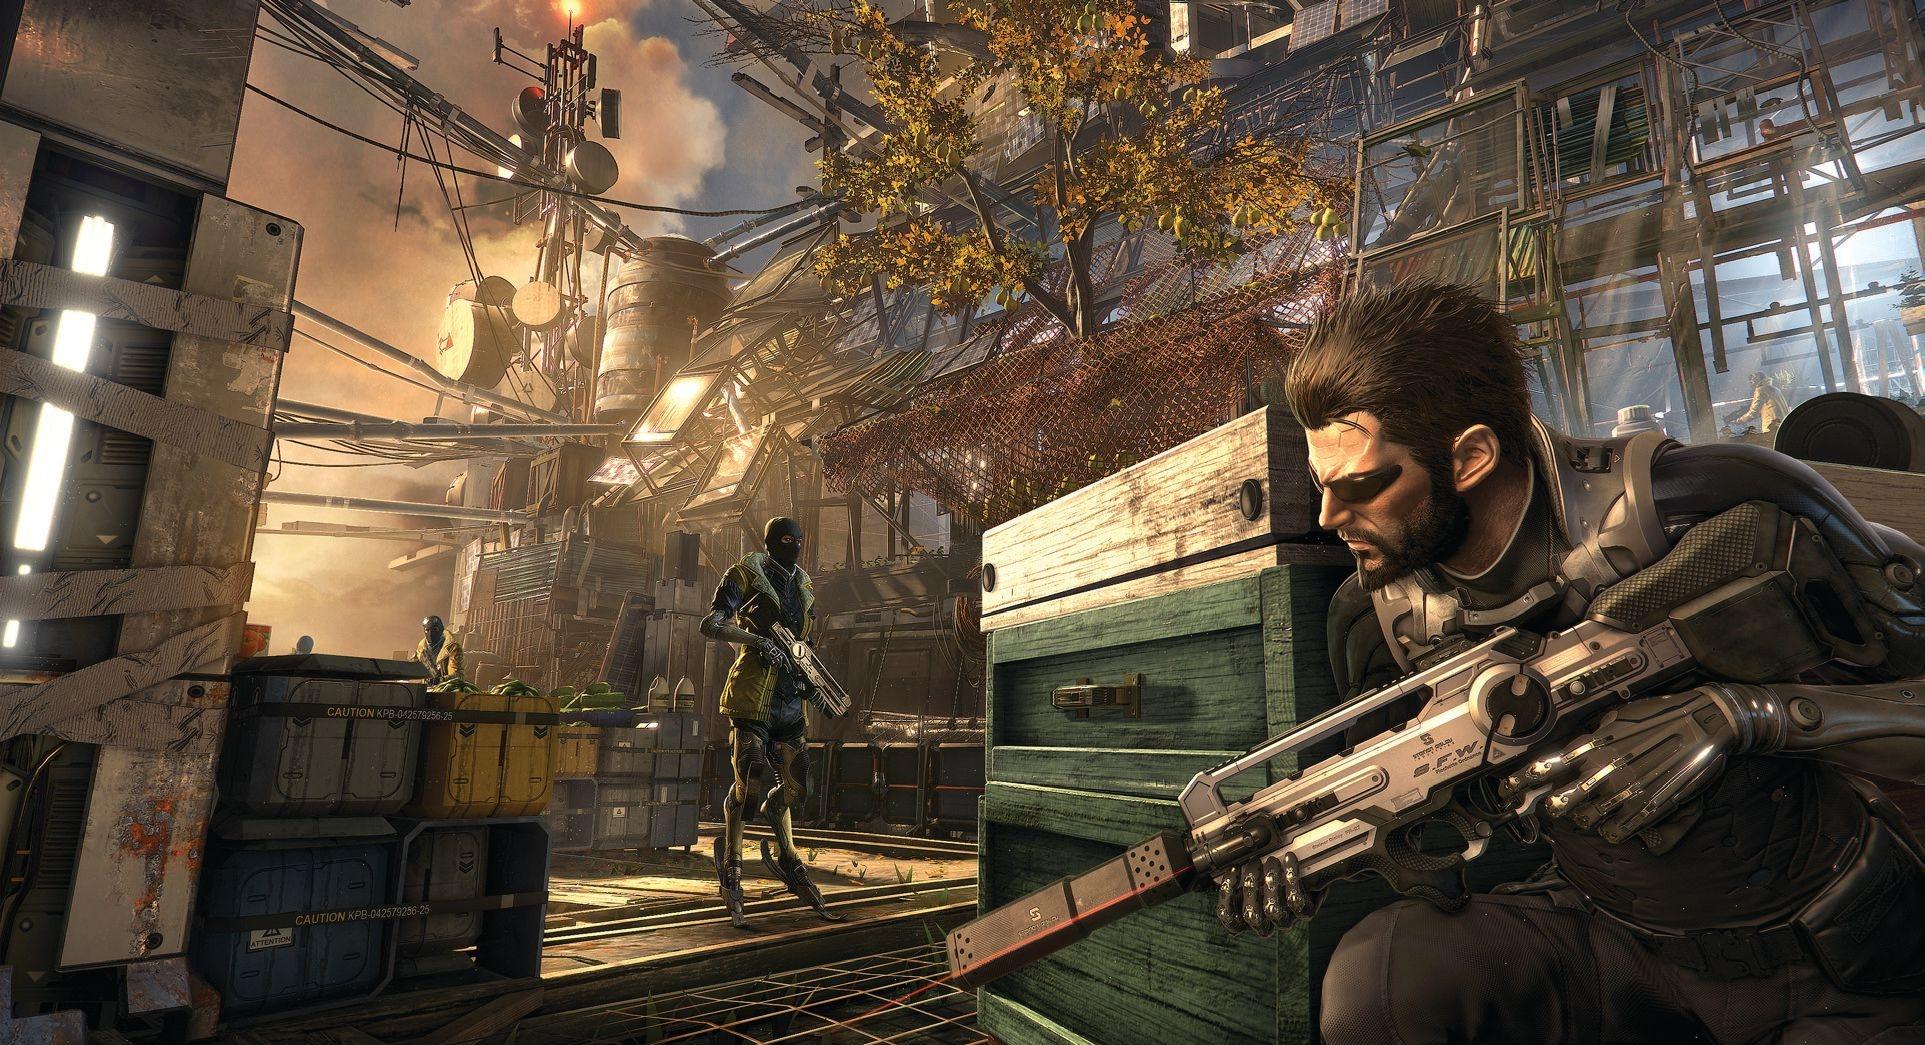 Acomódate para ver 25 minutos de Gameplay de Deus Ex: Manking Divided [Contiene Spoilers]